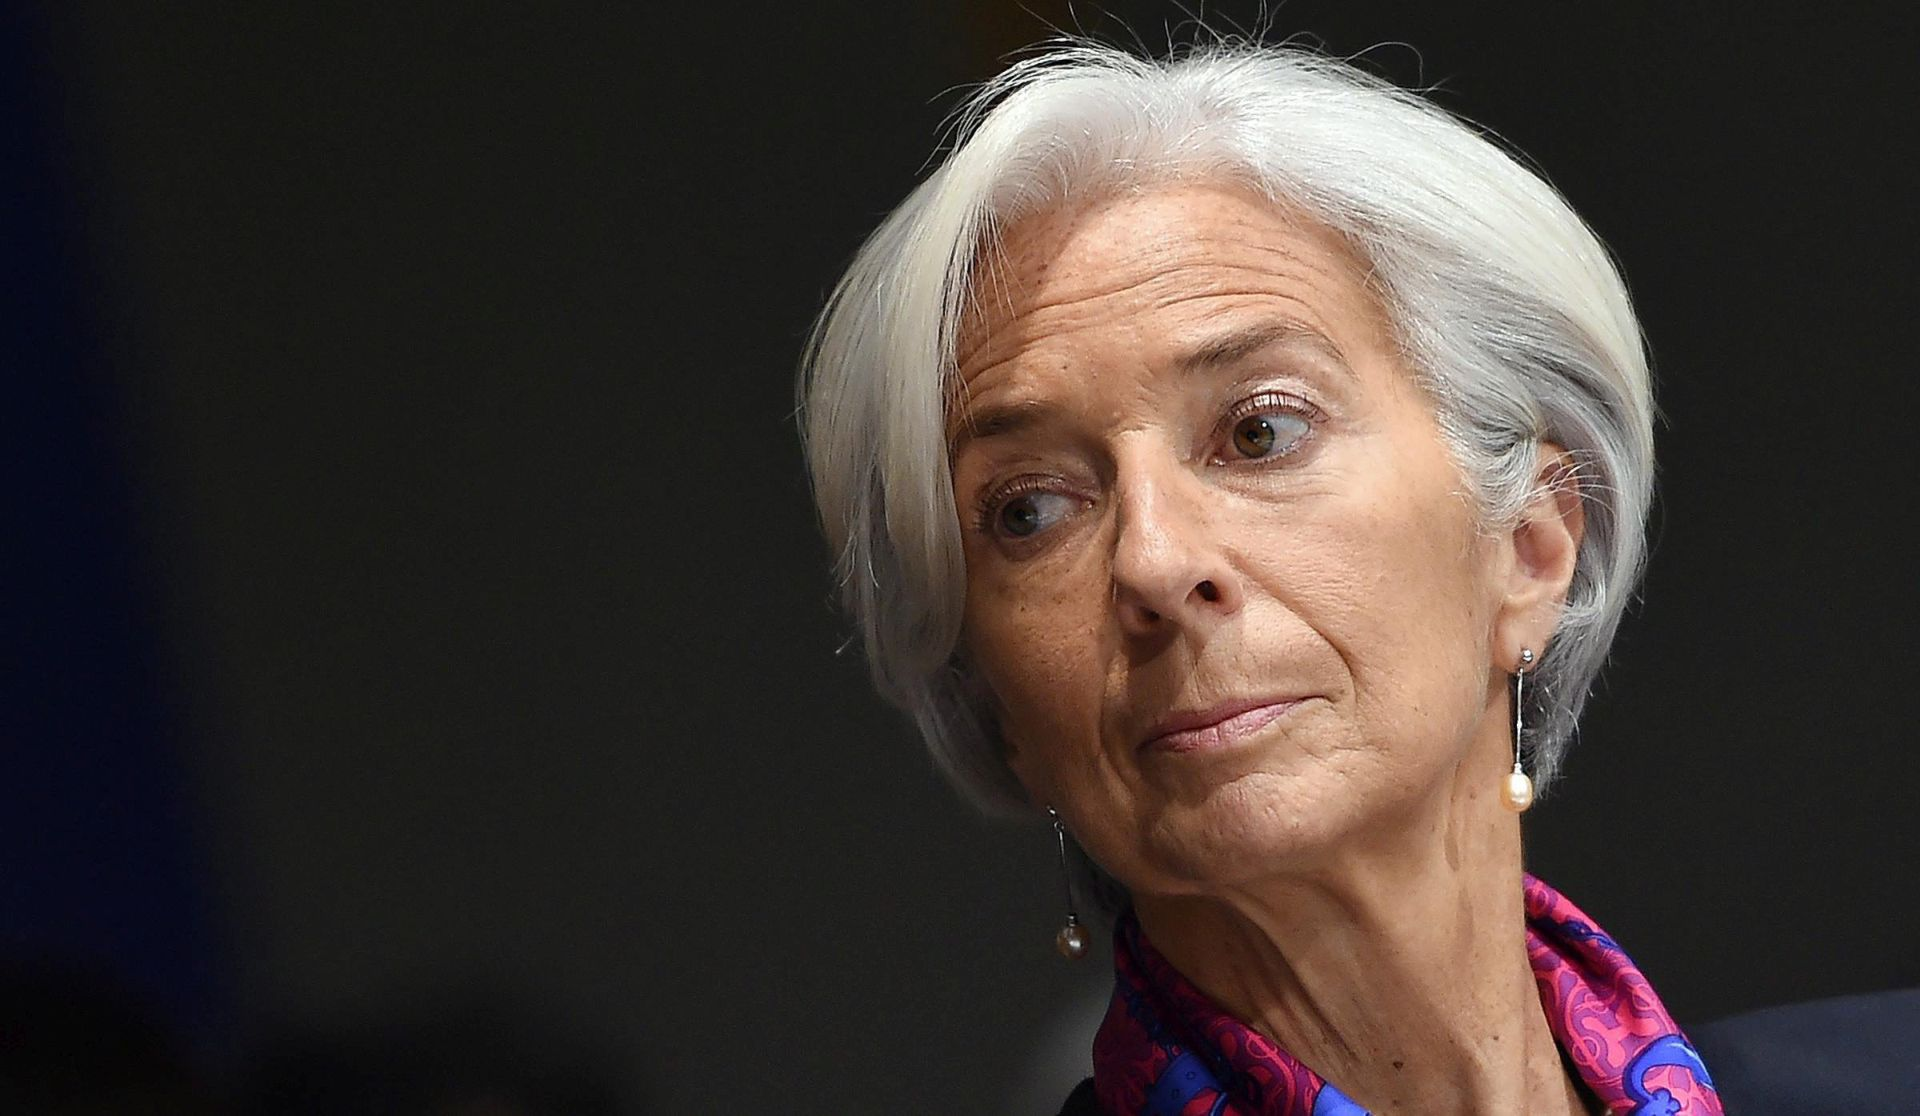 MMF 'Britansko gospodarstvo će oslabiti zbog Brexita'